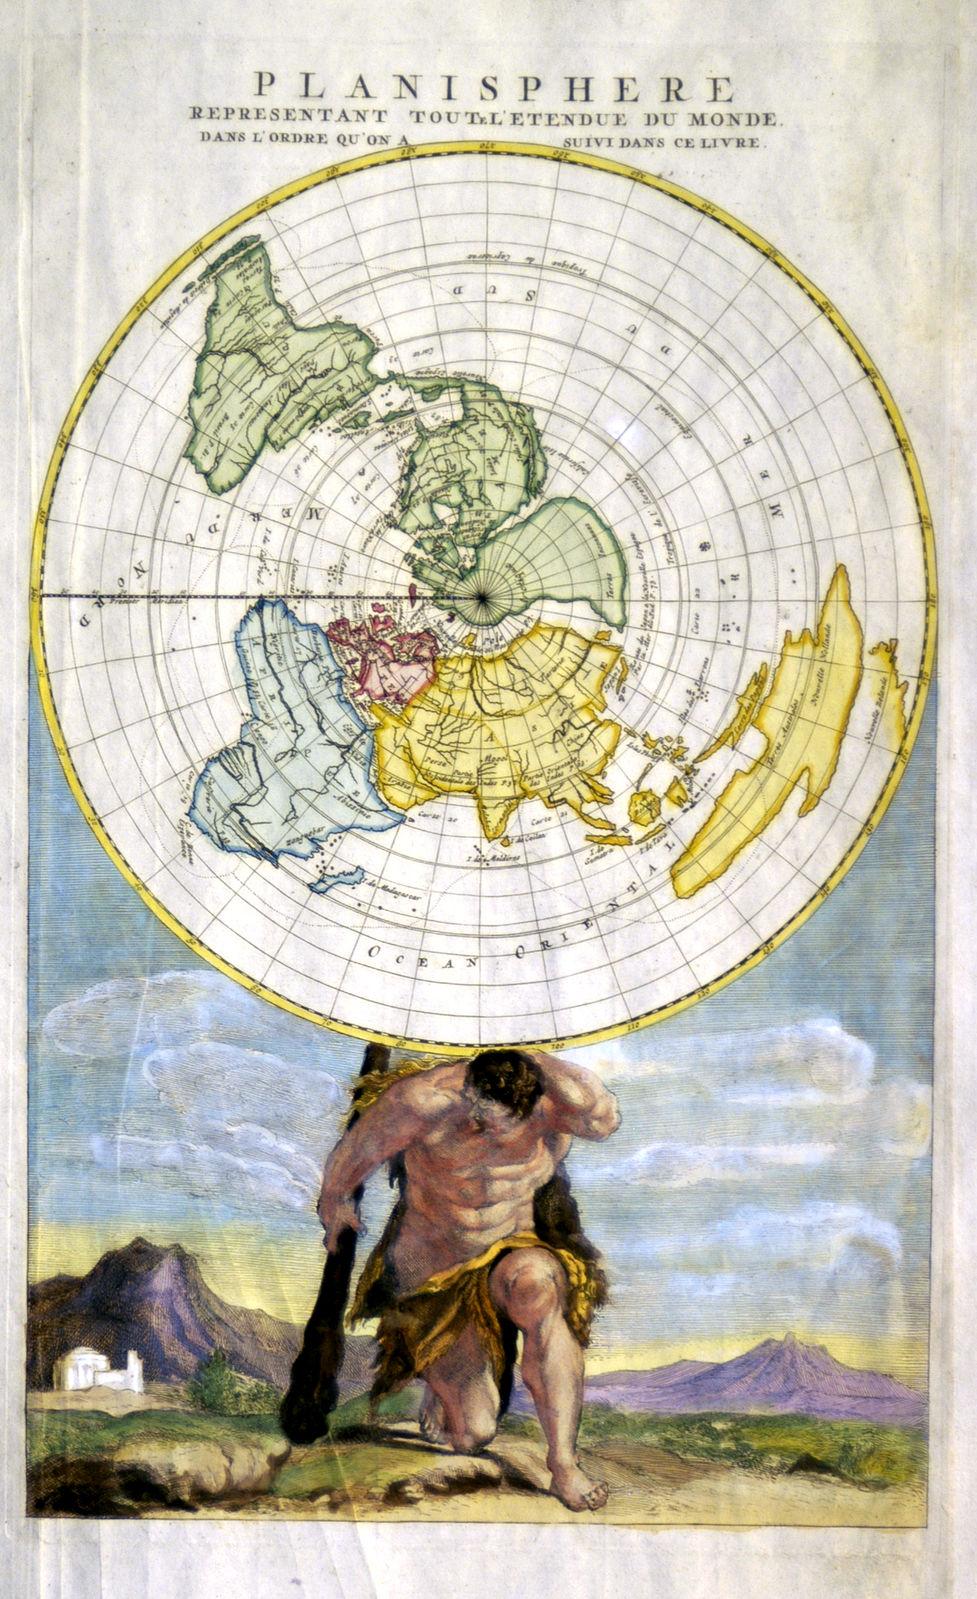 jonathan potter map planisphere representant toute l 39 entendu du monde. Black Bedroom Furniture Sets. Home Design Ideas